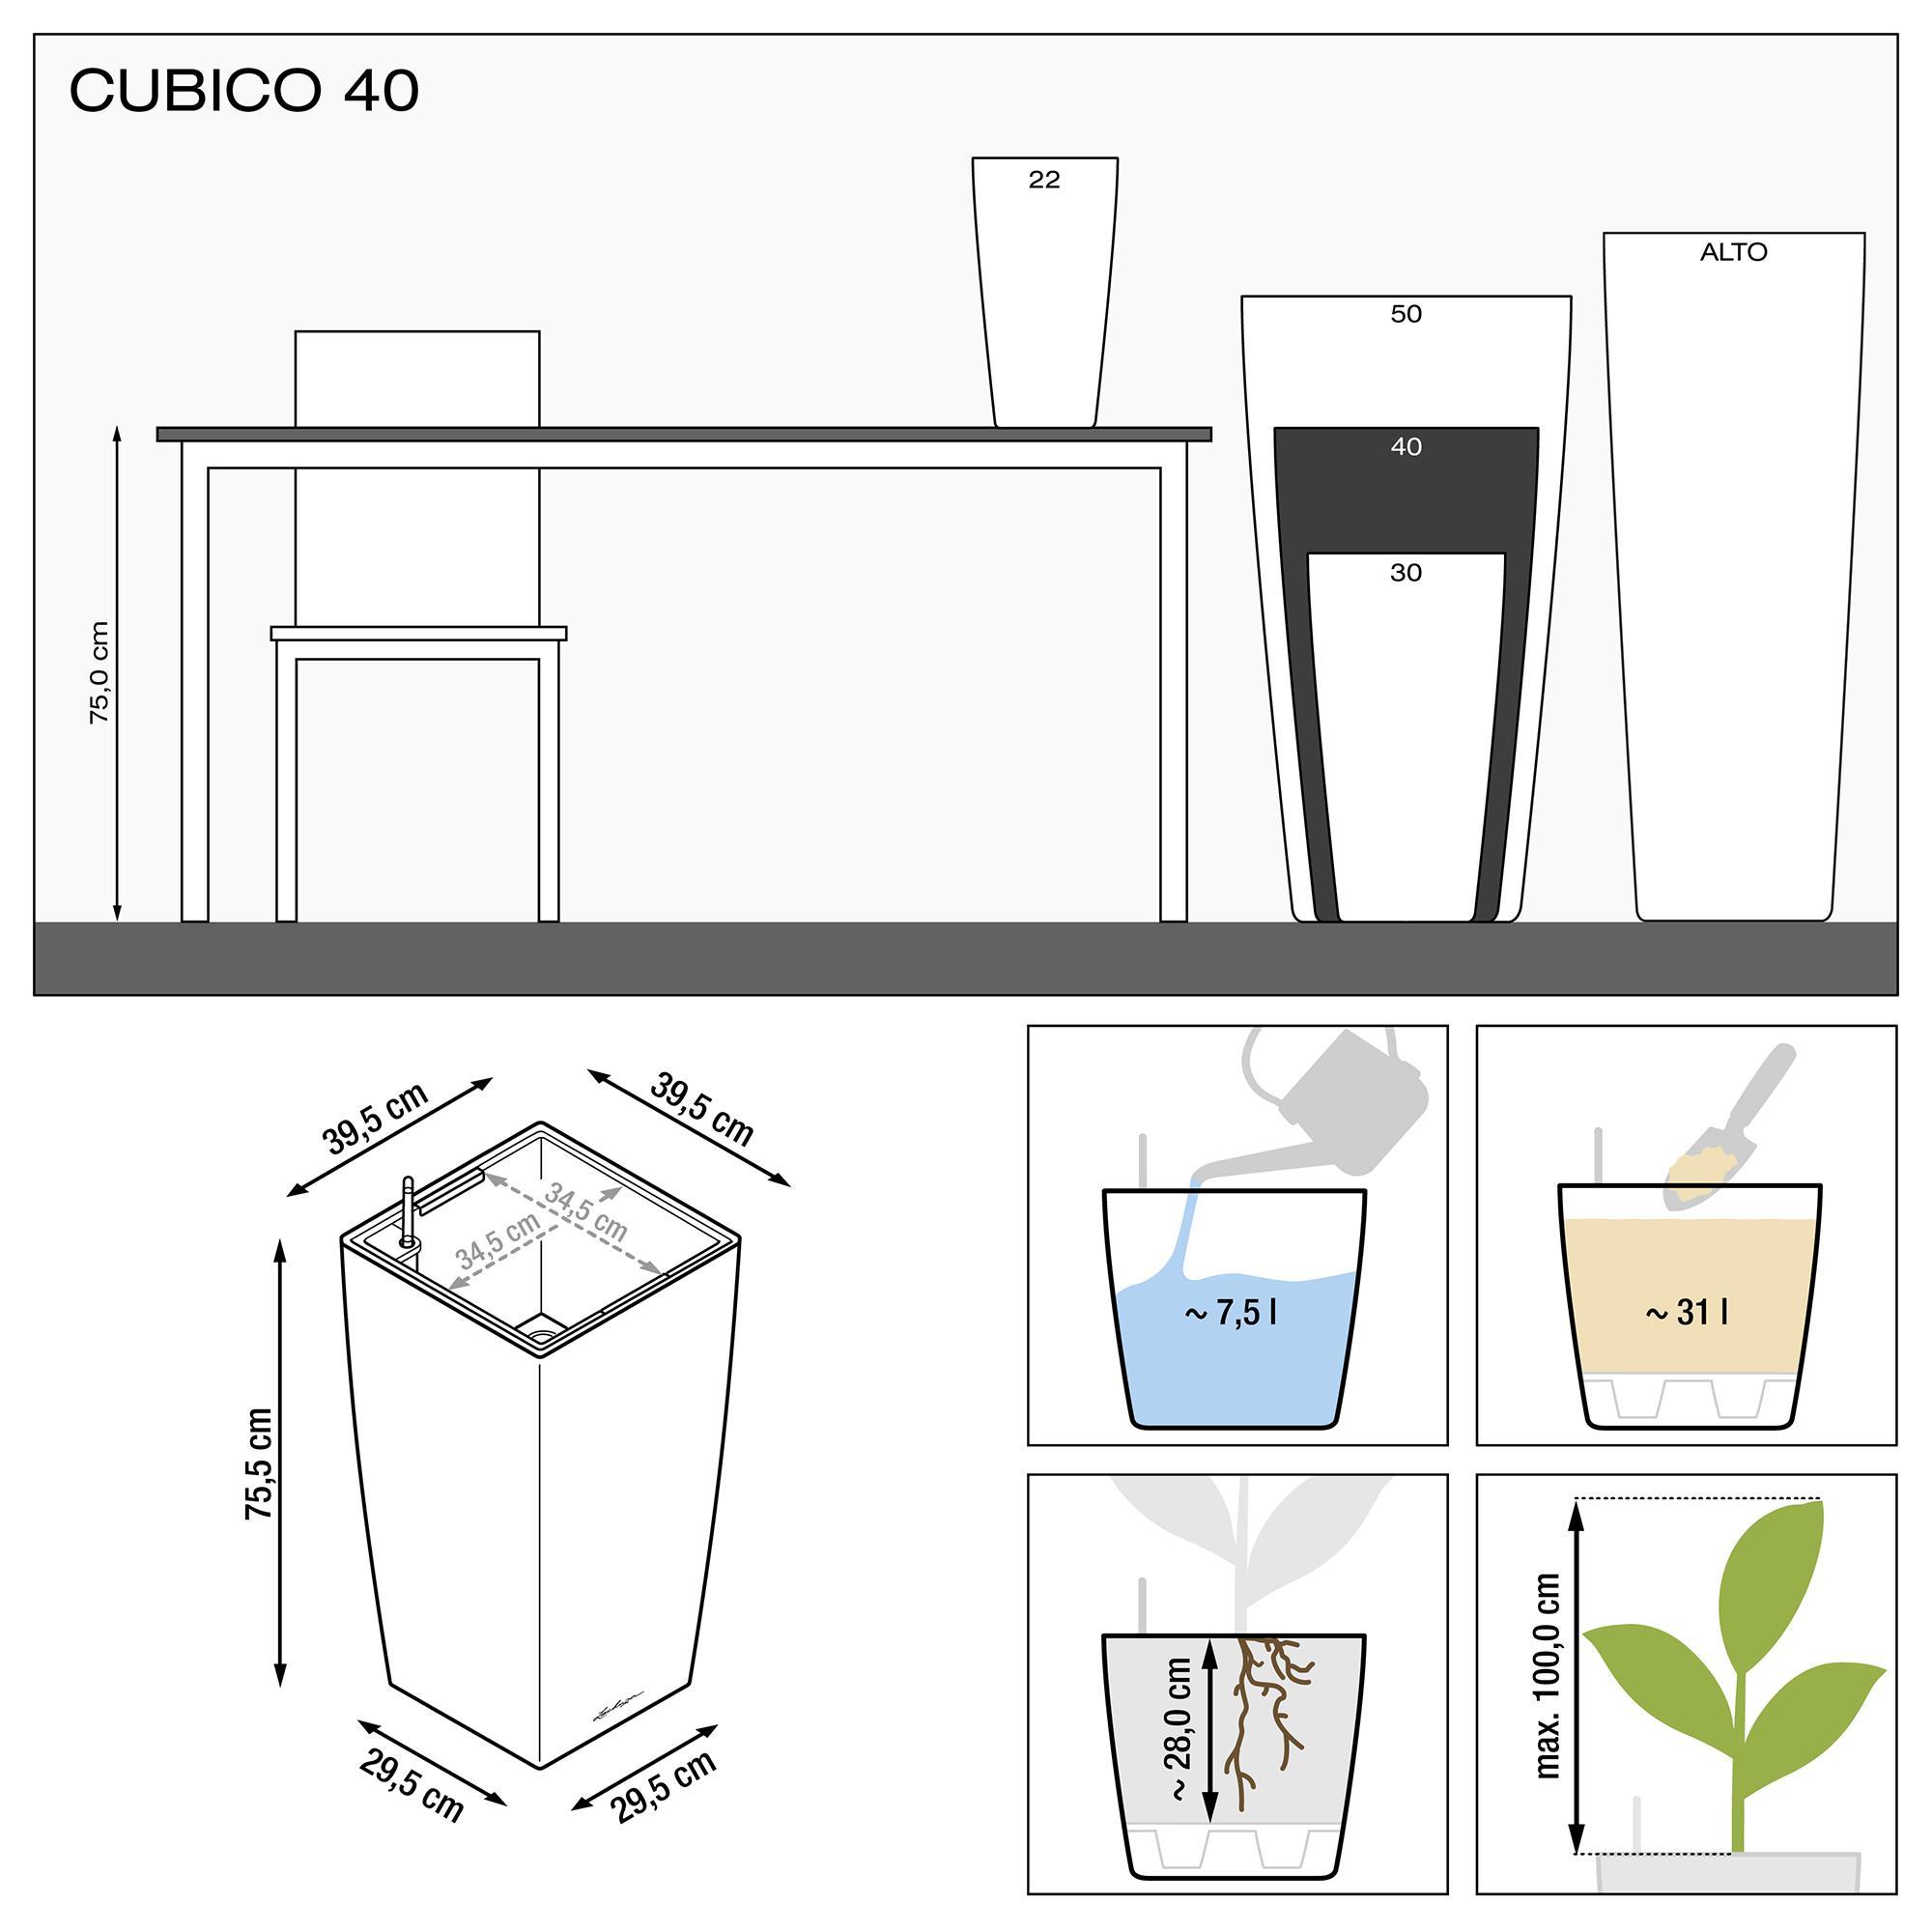 CUBICO 40 noir brillant - Image 3